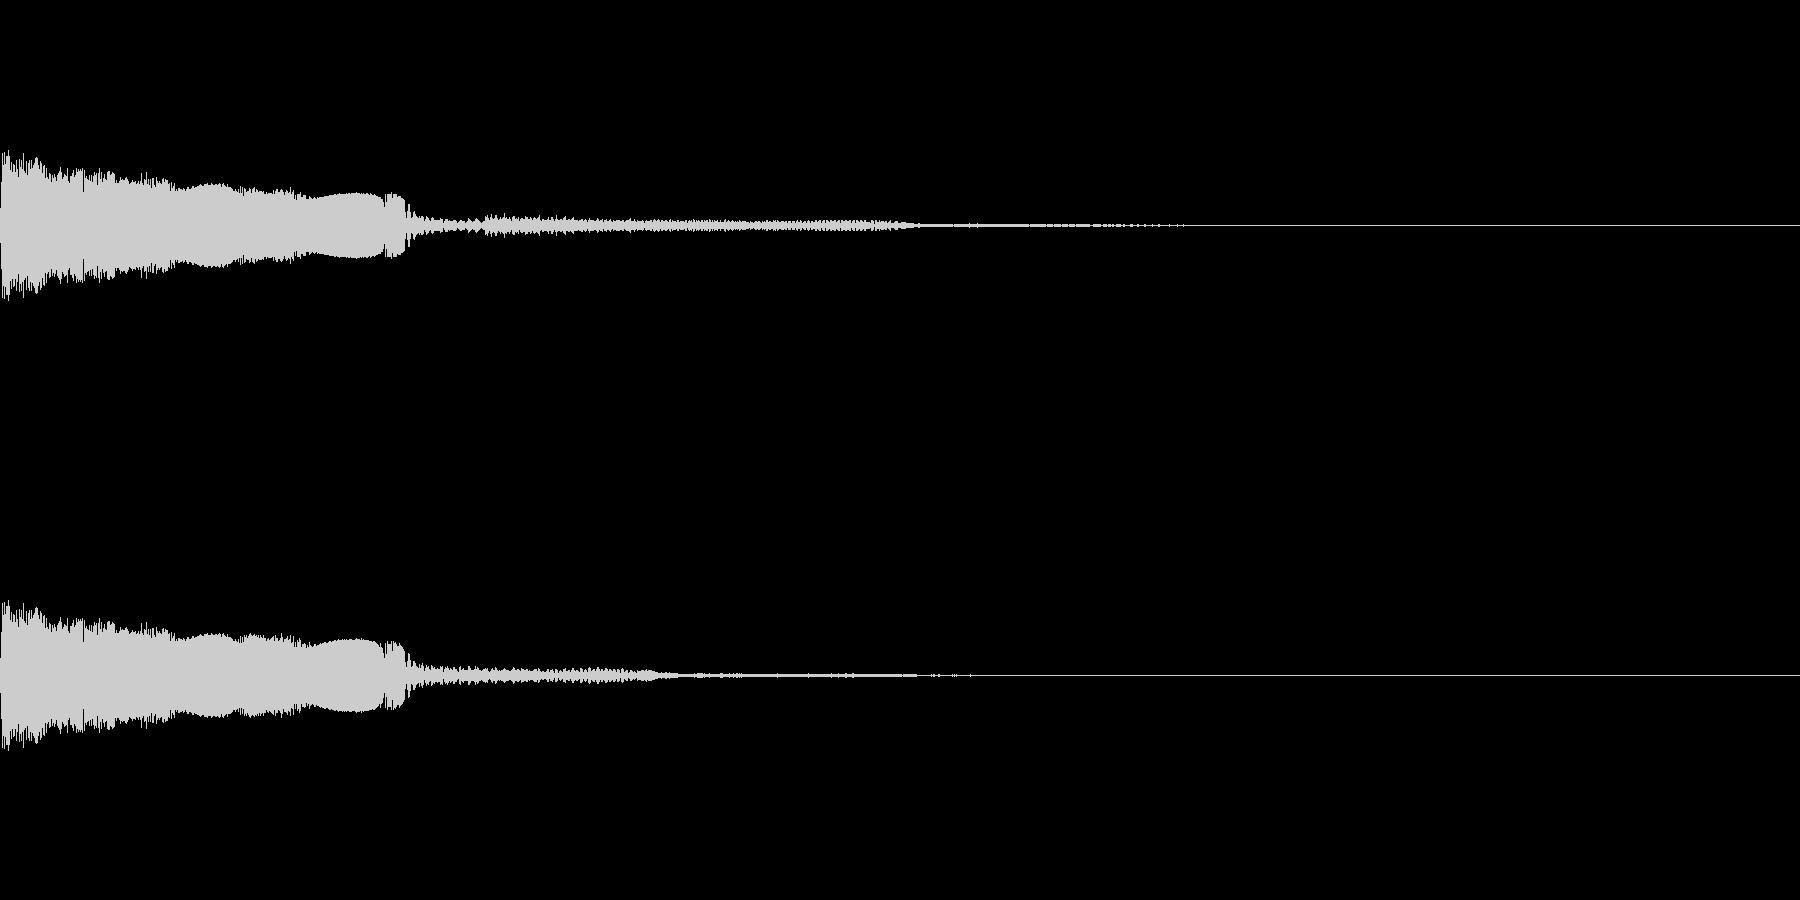 【SE 効果音】不安な音5の未再生の波形